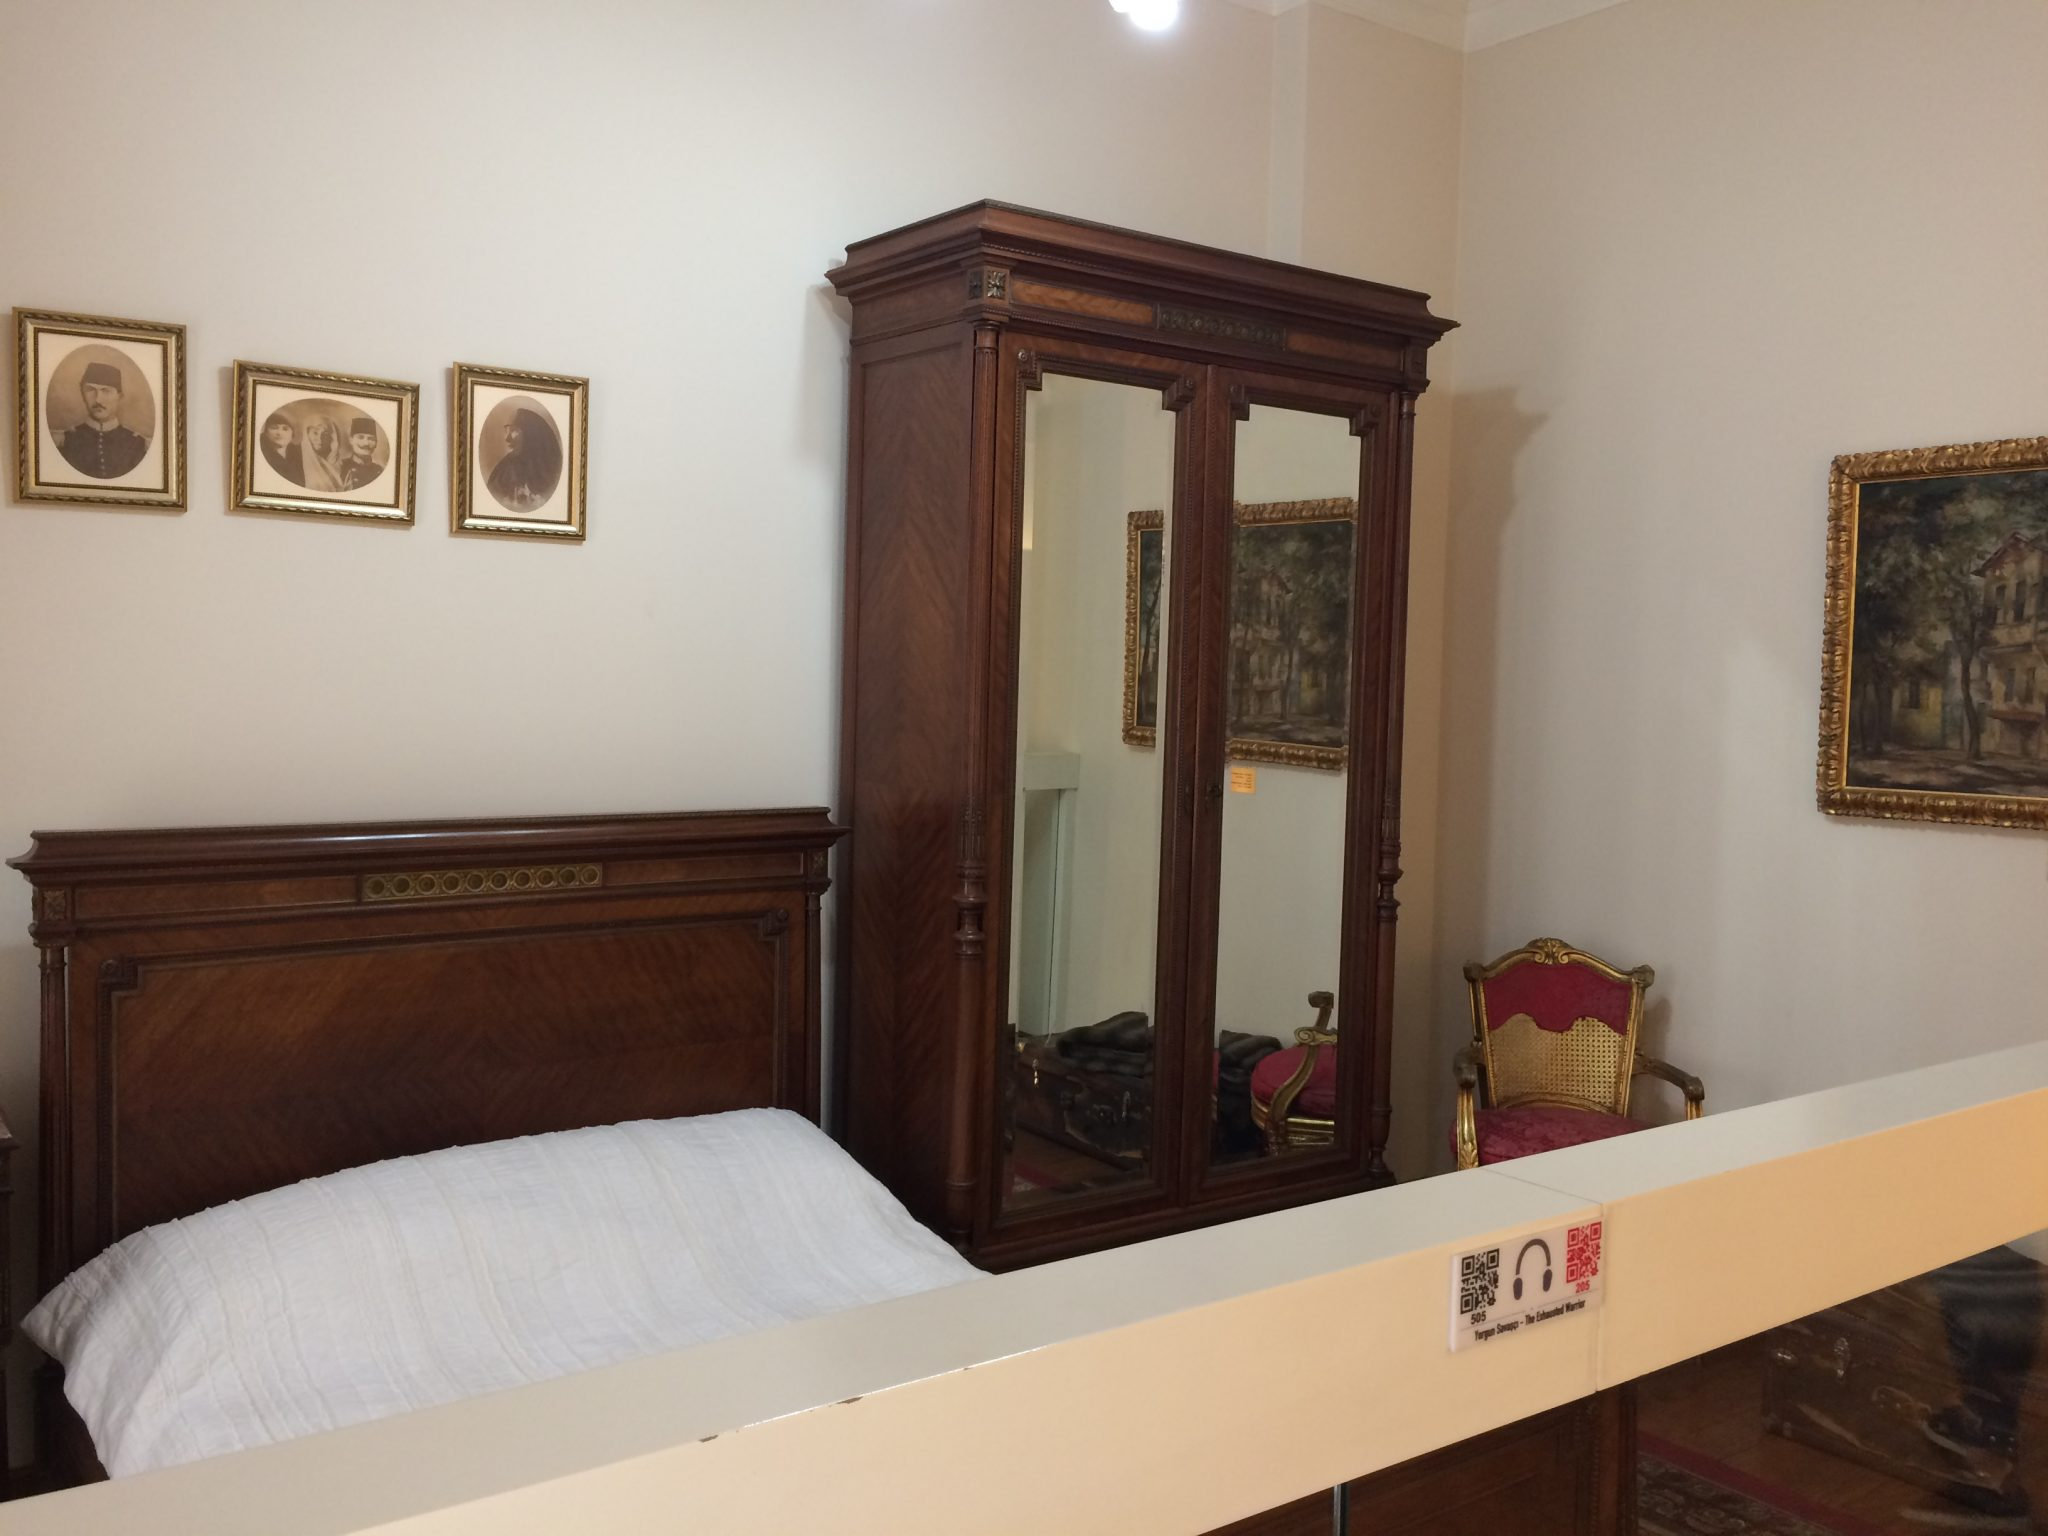 Atatürk'ün Odası